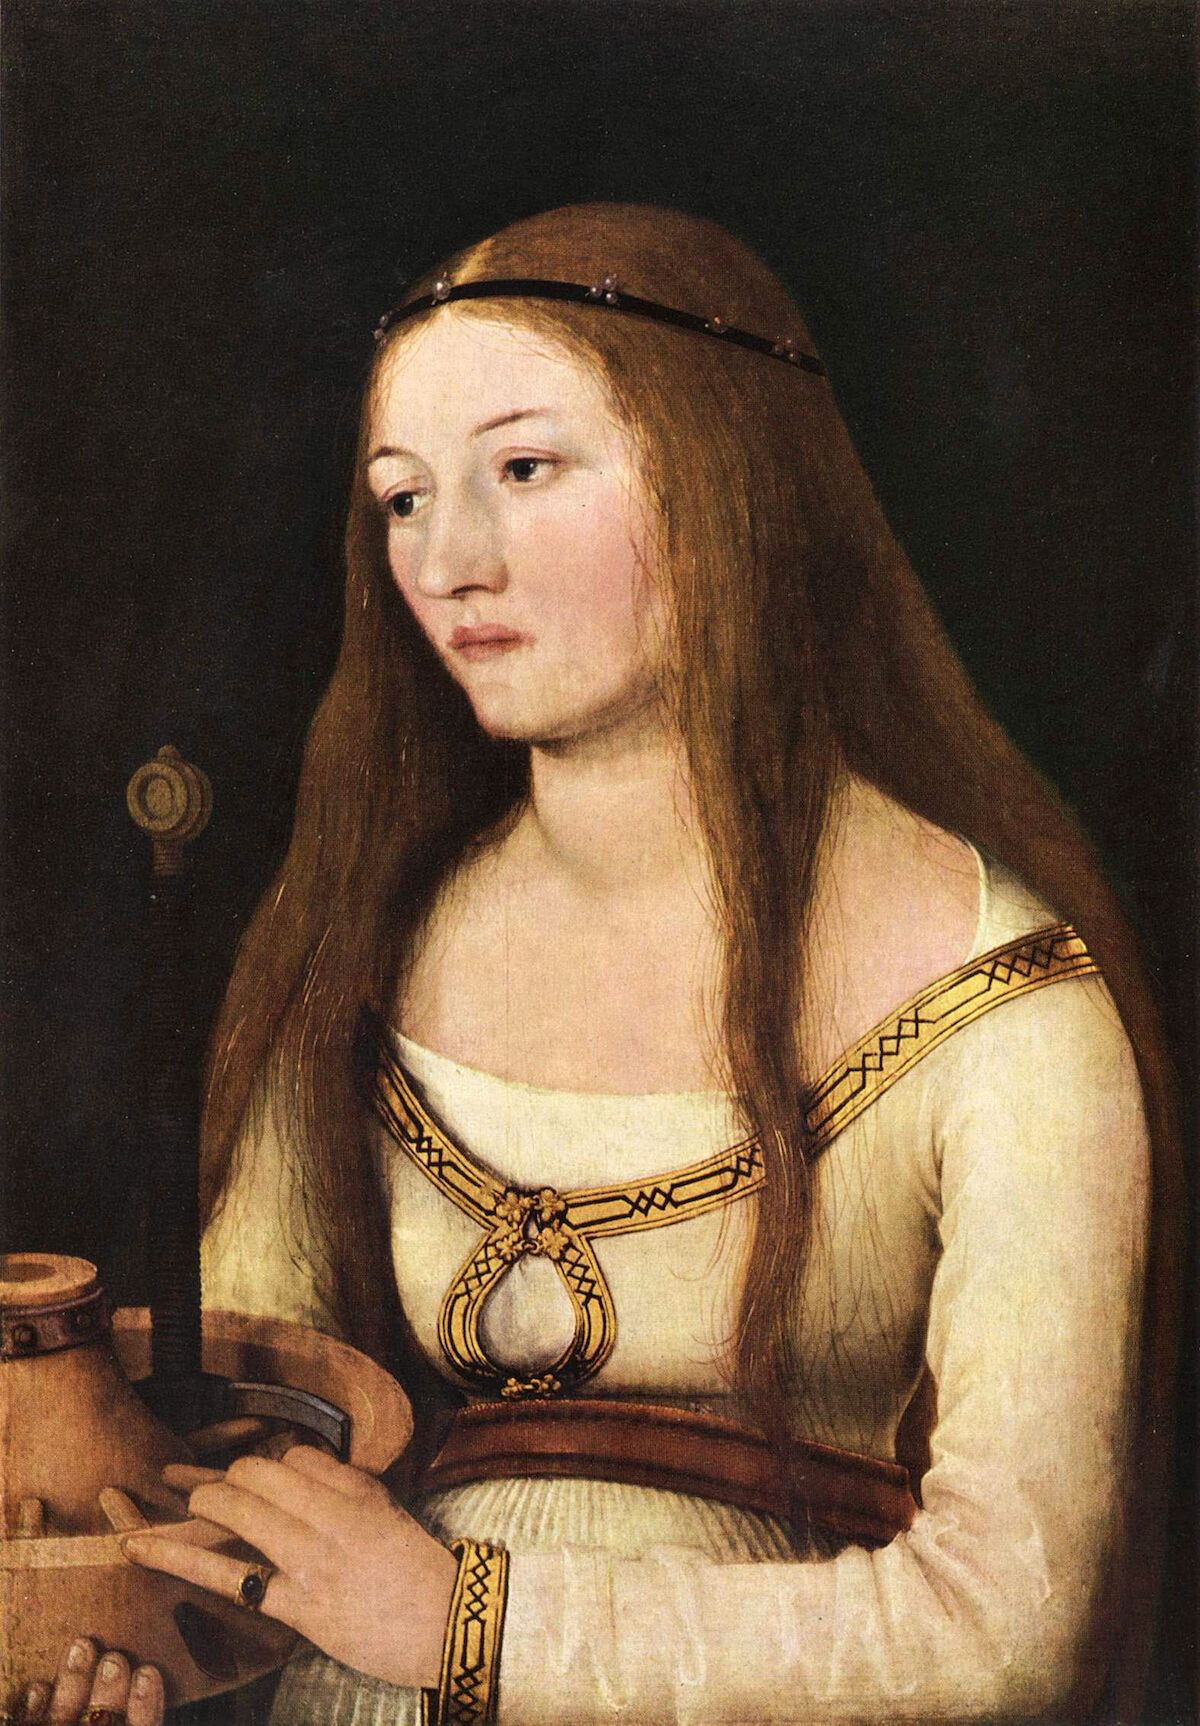 Hans Holbein the Elder portrait of Saint Catherine (1510). Via Wikimedia Commons.